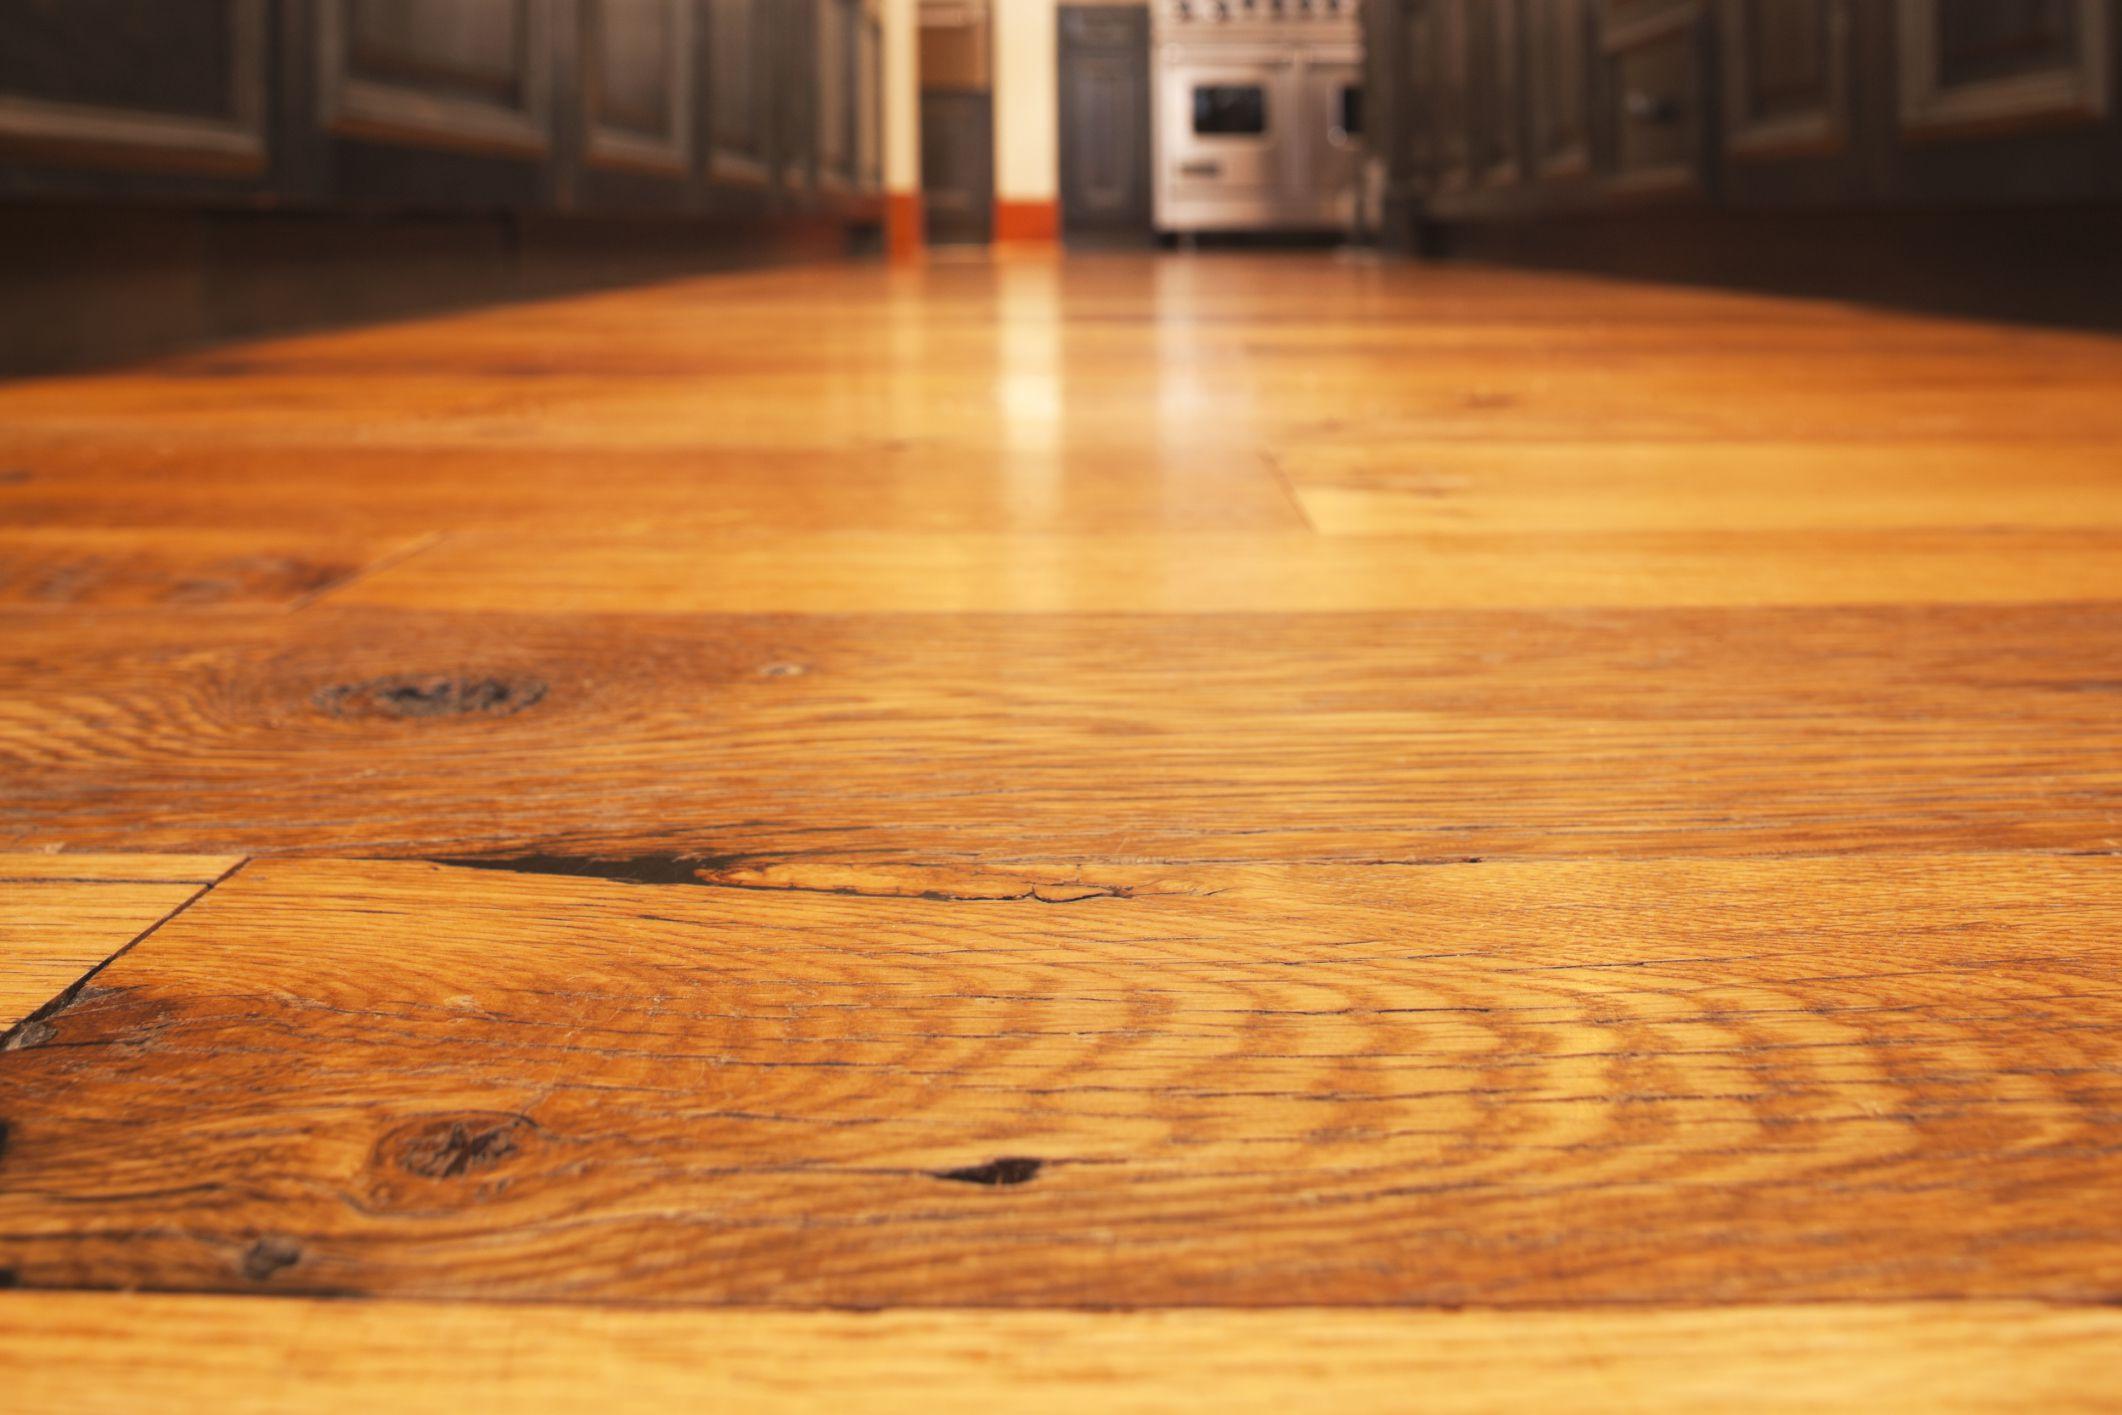 hardwood floor filler repair of why a microbevel is on your flooring inside wood floor closeup microbevel 56a4a13f5f9b58b7d0d7e5f4